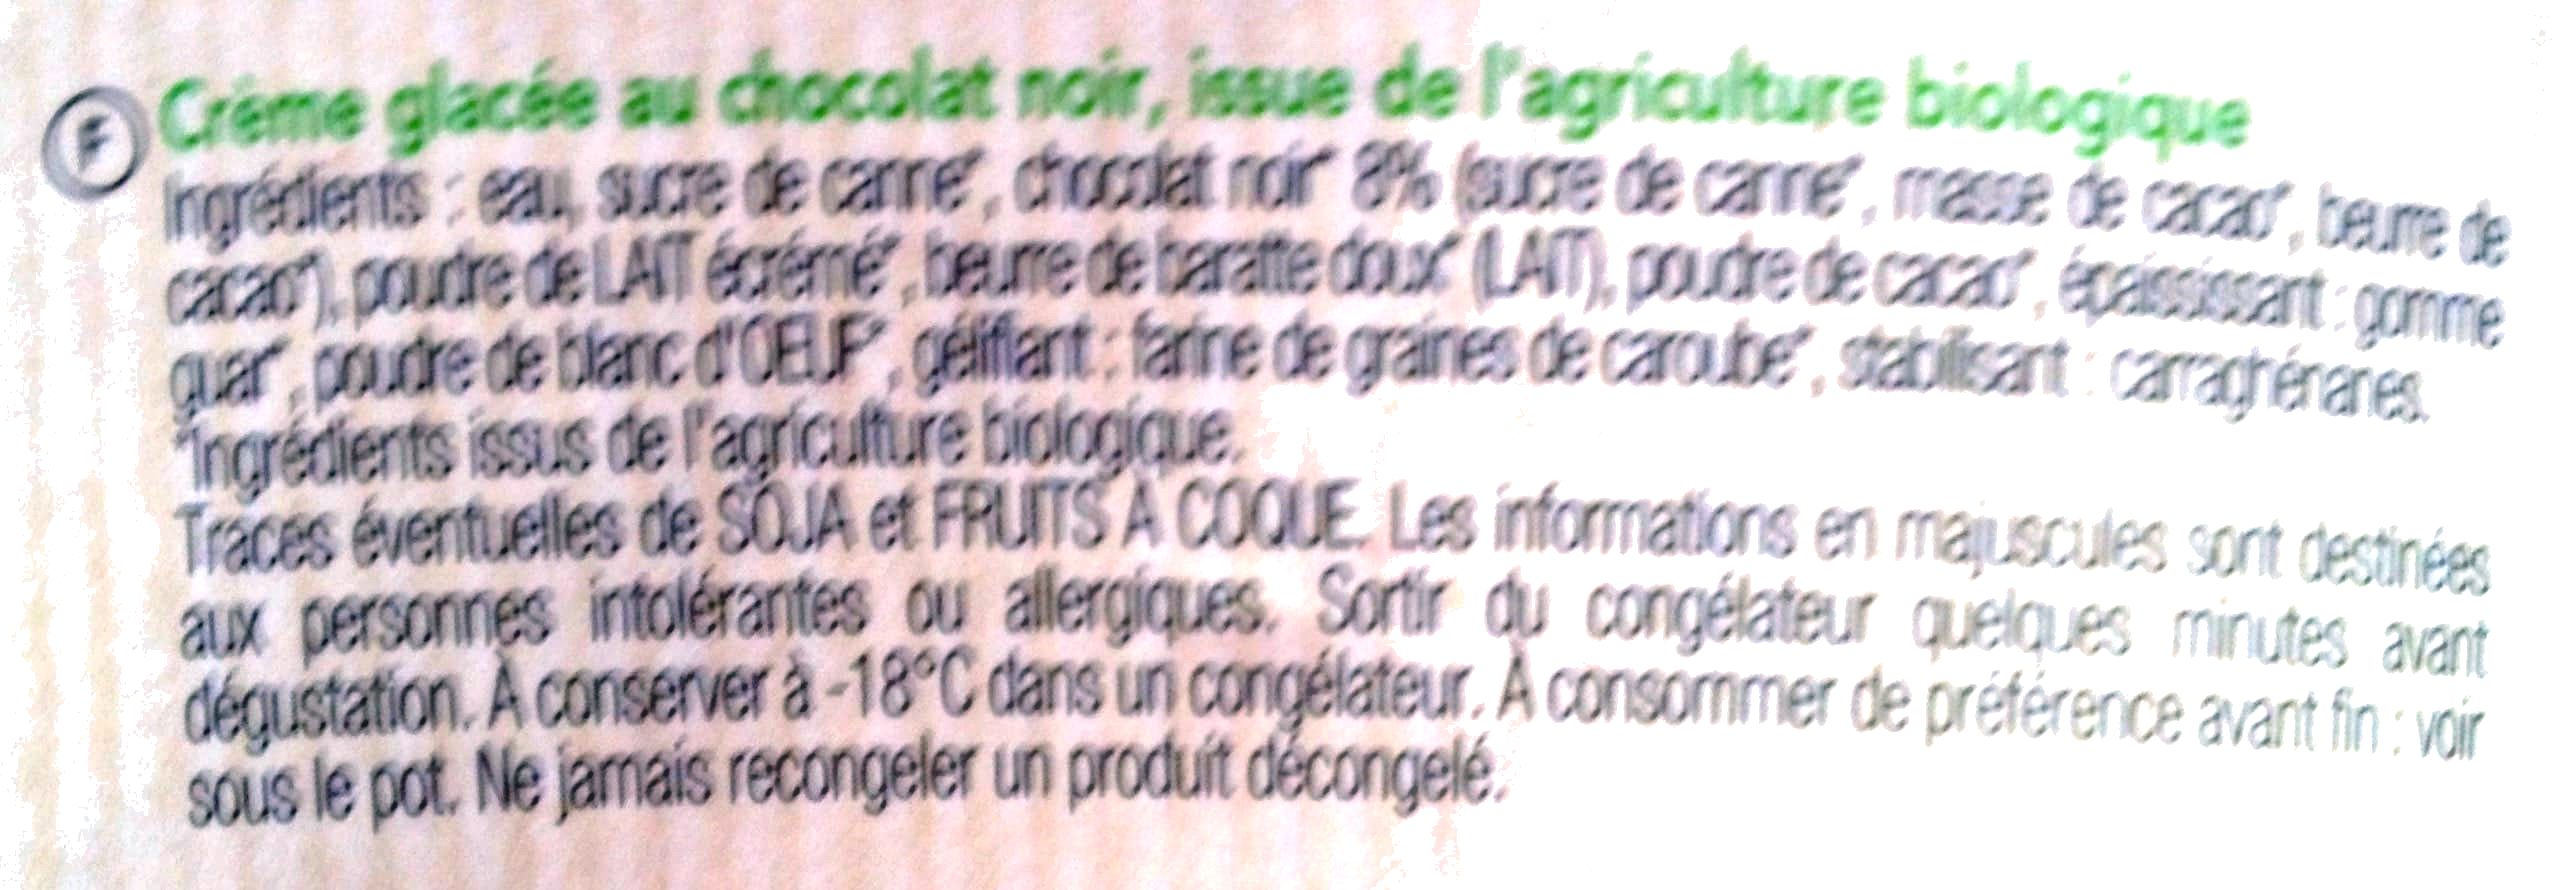 Crême glacée Bio Chocolat - Ingrédients